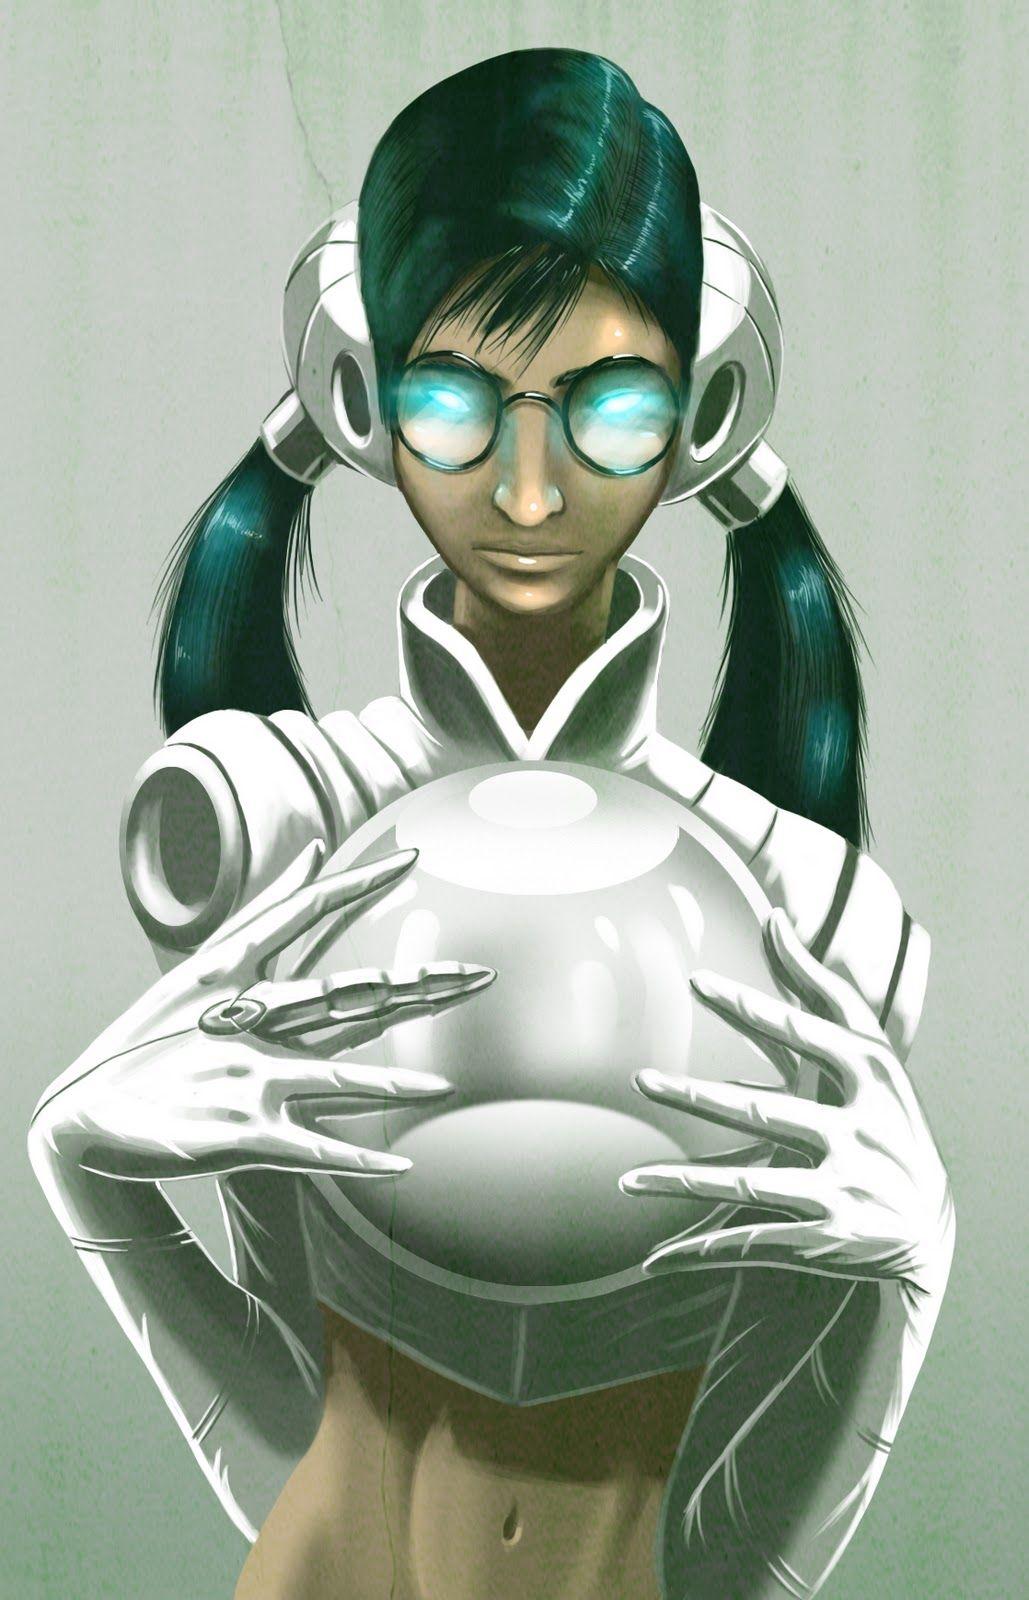 Retro Sci-Fi Girl Annelies 3D Model | Sci fi girl, 3d